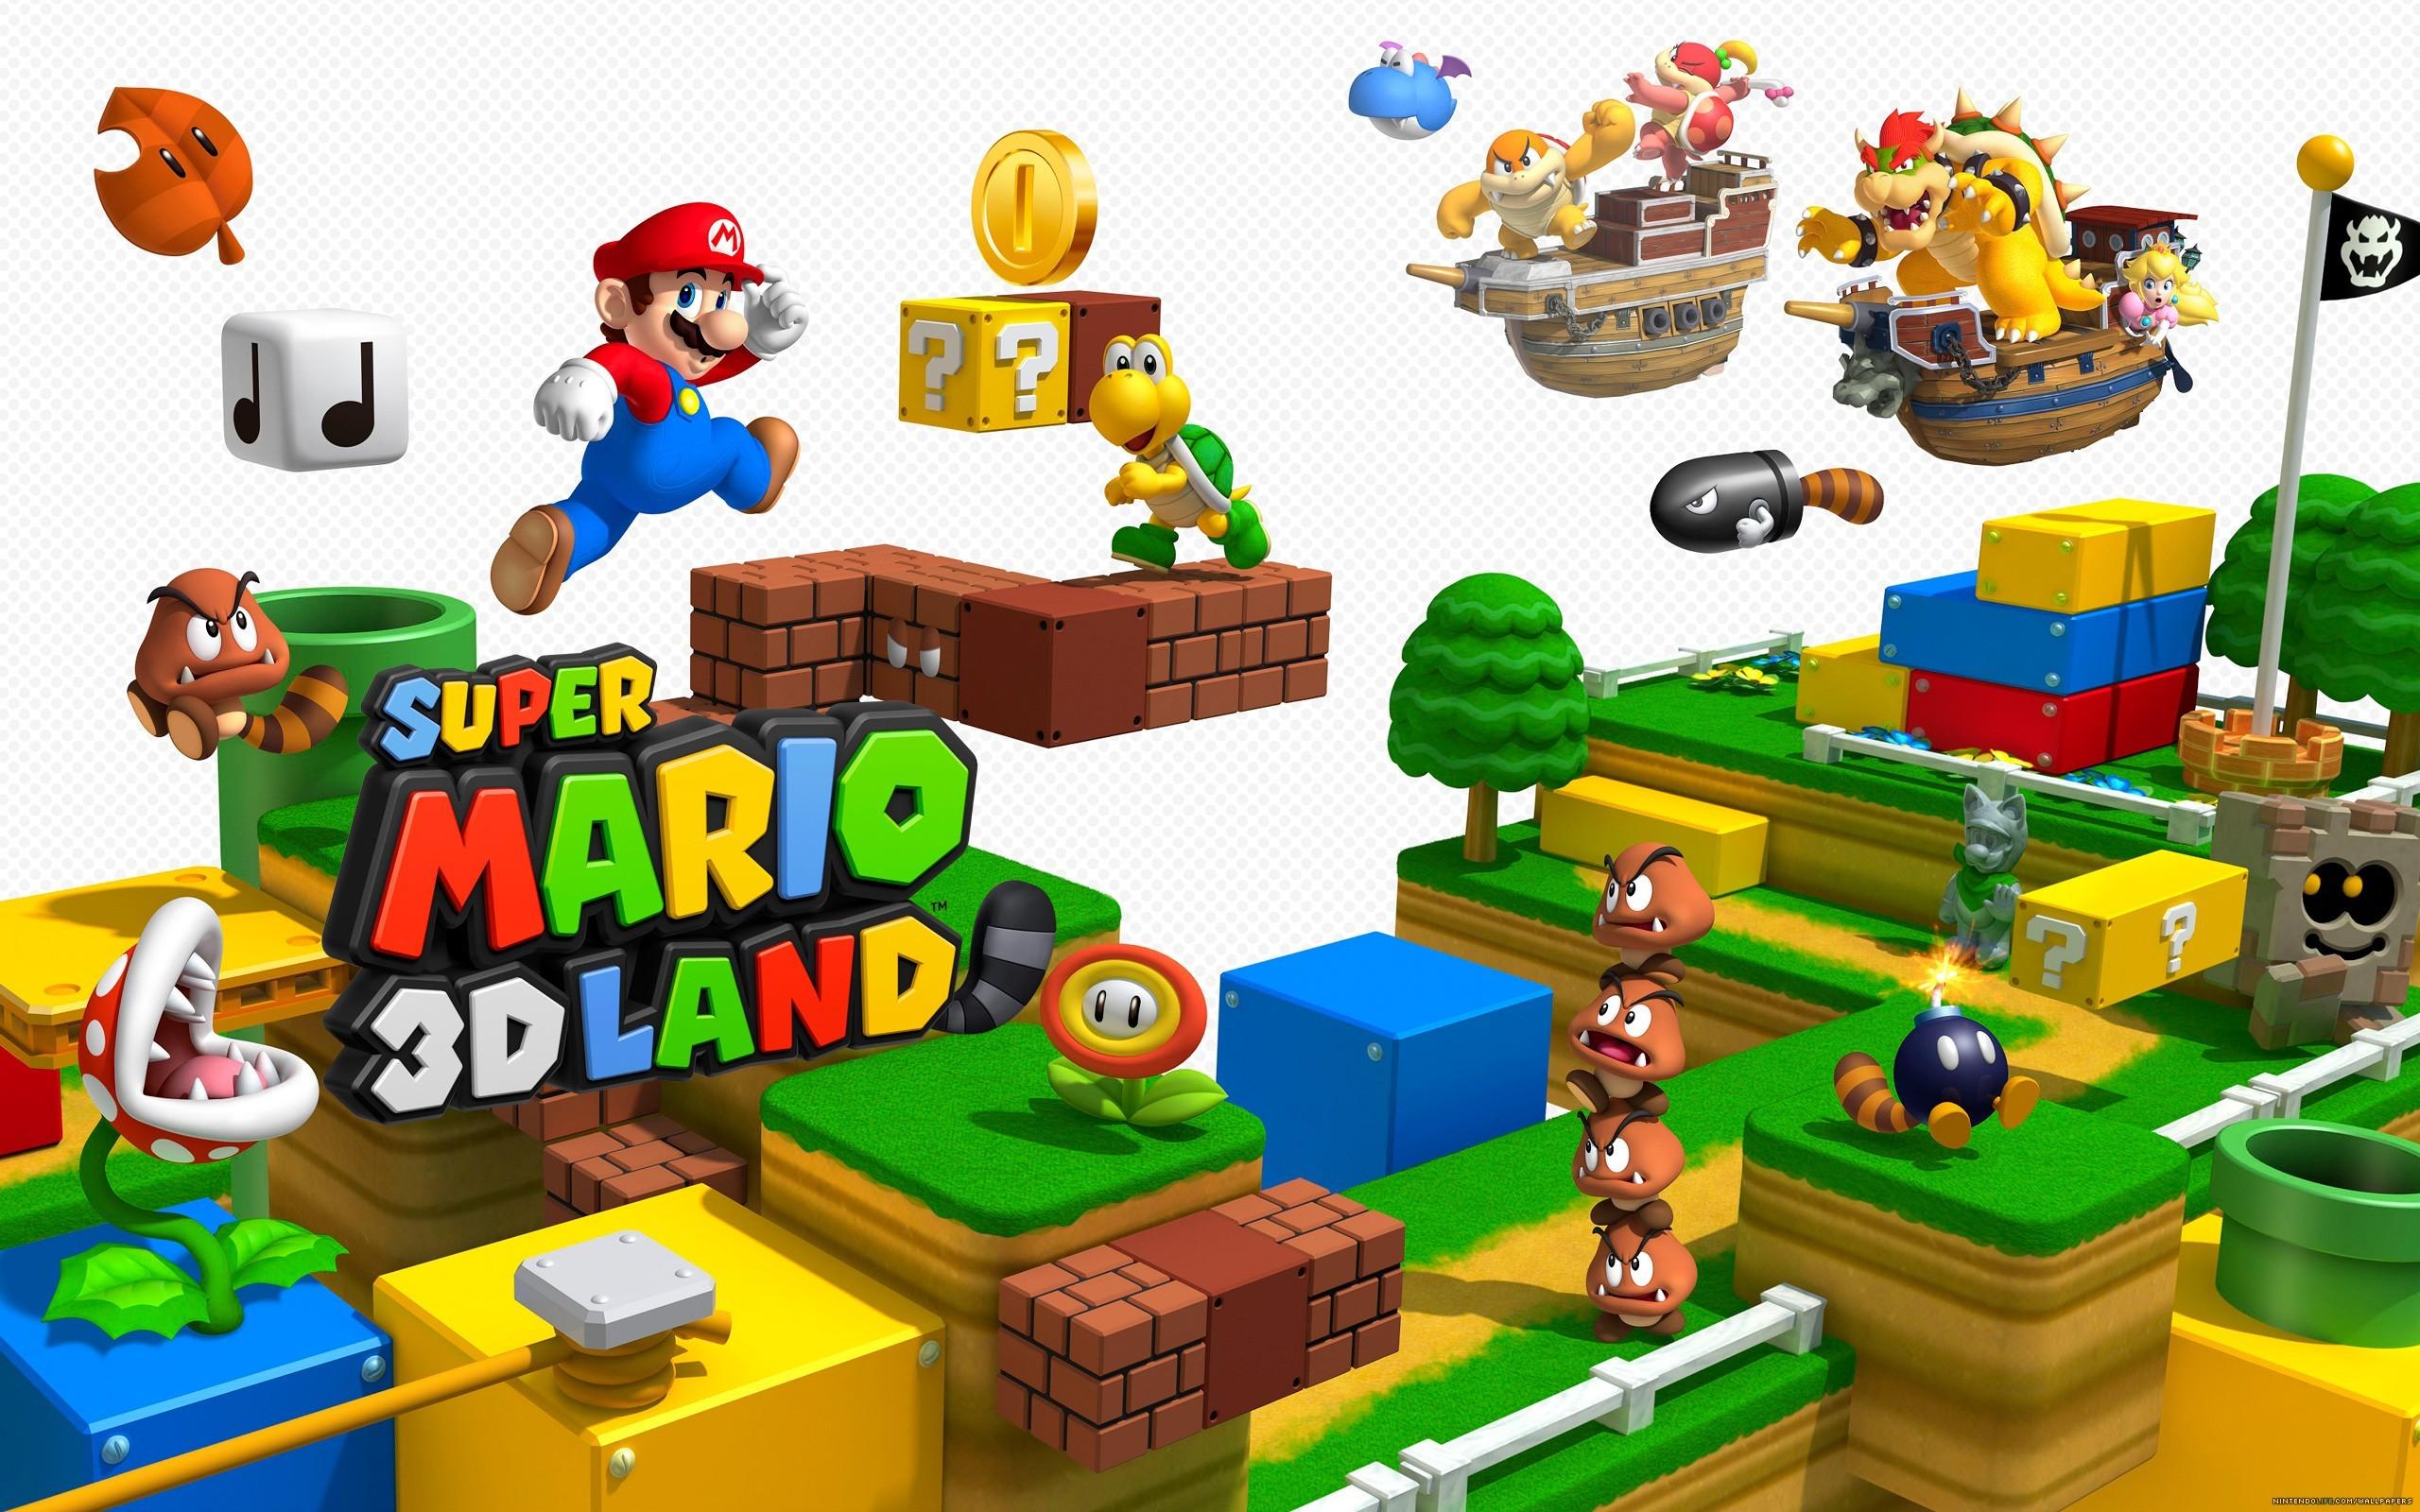 Super Mario Wallpaper eBay | HD Wallpapers | Pinterest | Mario, Wallpaper  and Hd wallpaper